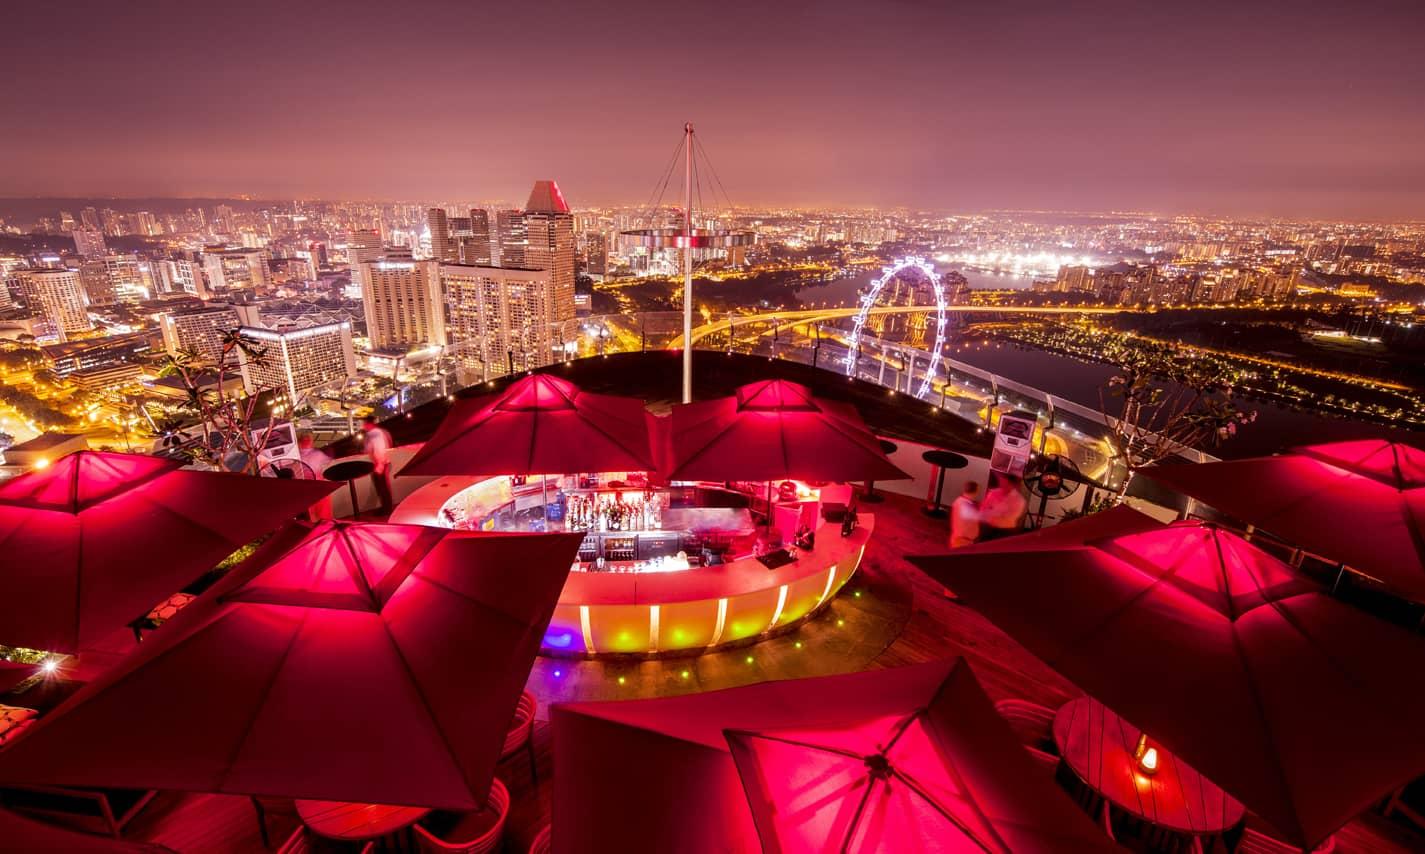 ce-la-vi-sky-bar-at-night-in-marina-bay